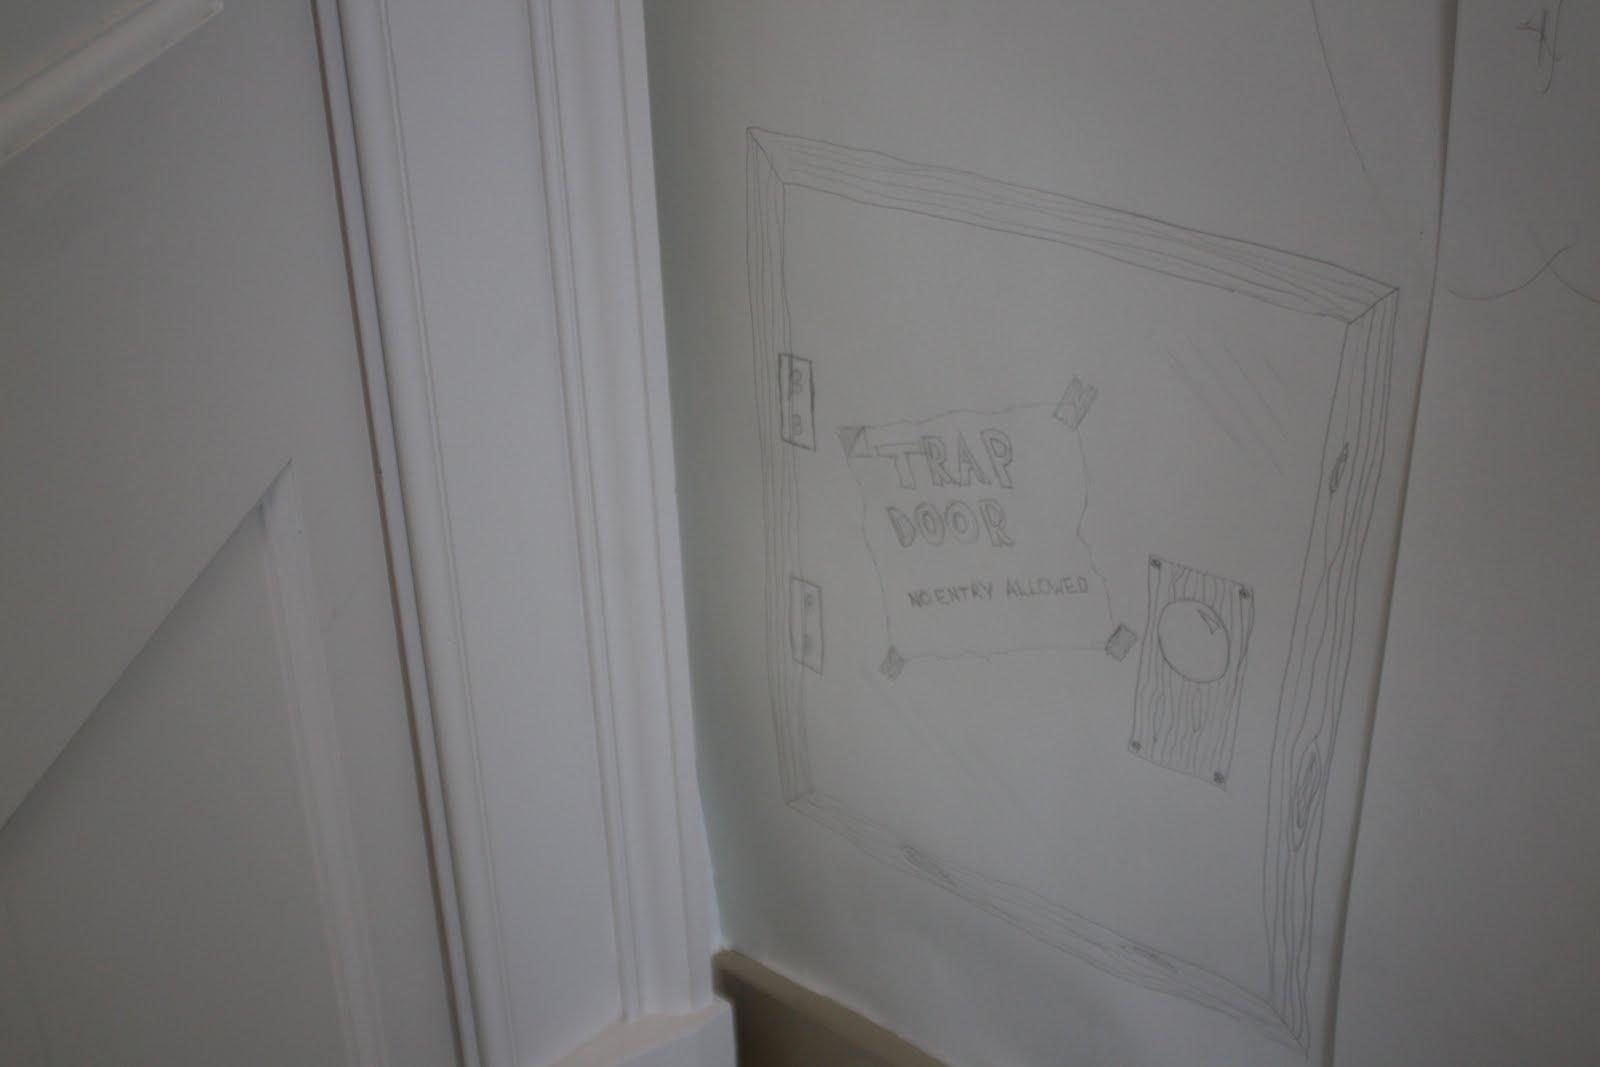 [2+weeks+on+Big+Draw+2009+002.jpg]